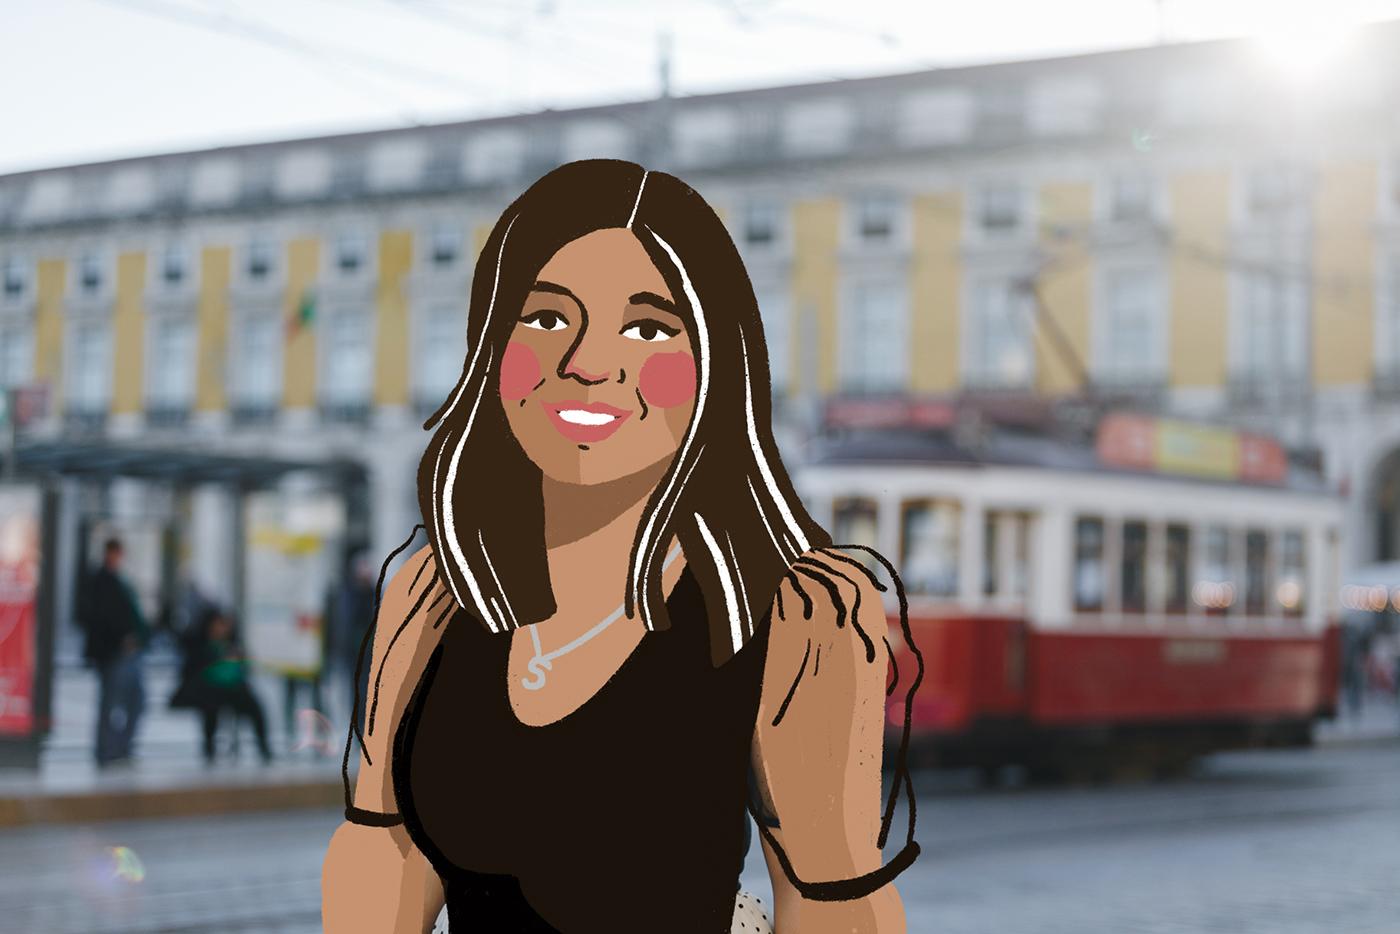 sherica_ocbania-lisbon-s1_28